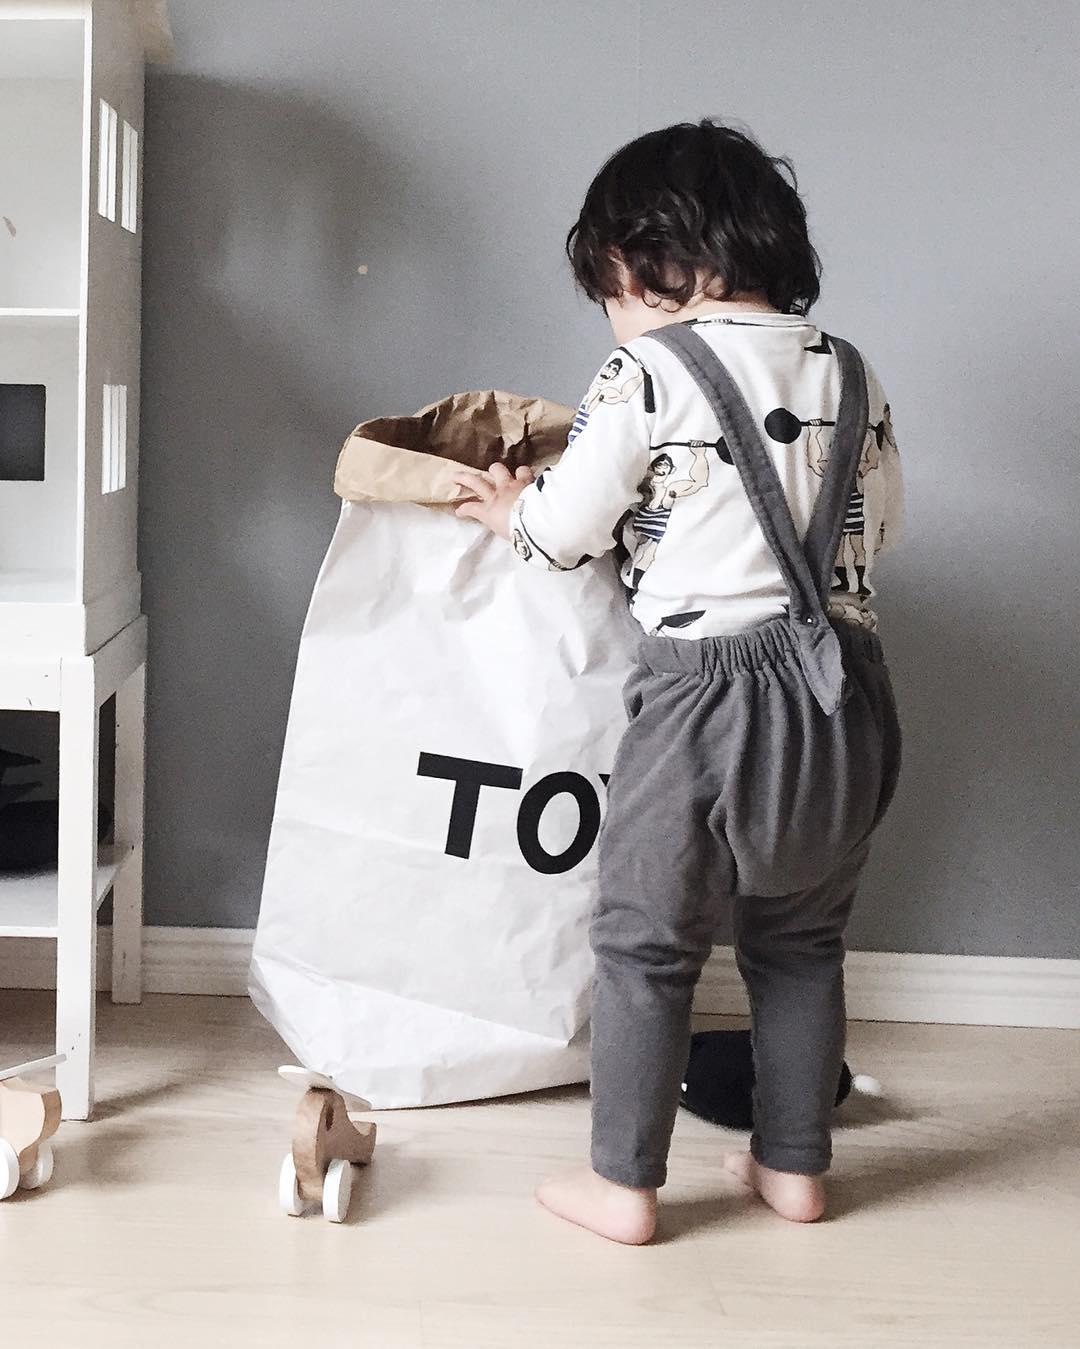 Tellkiddo 瑞典可愛圖案牛皮紙收納袋 Toys1